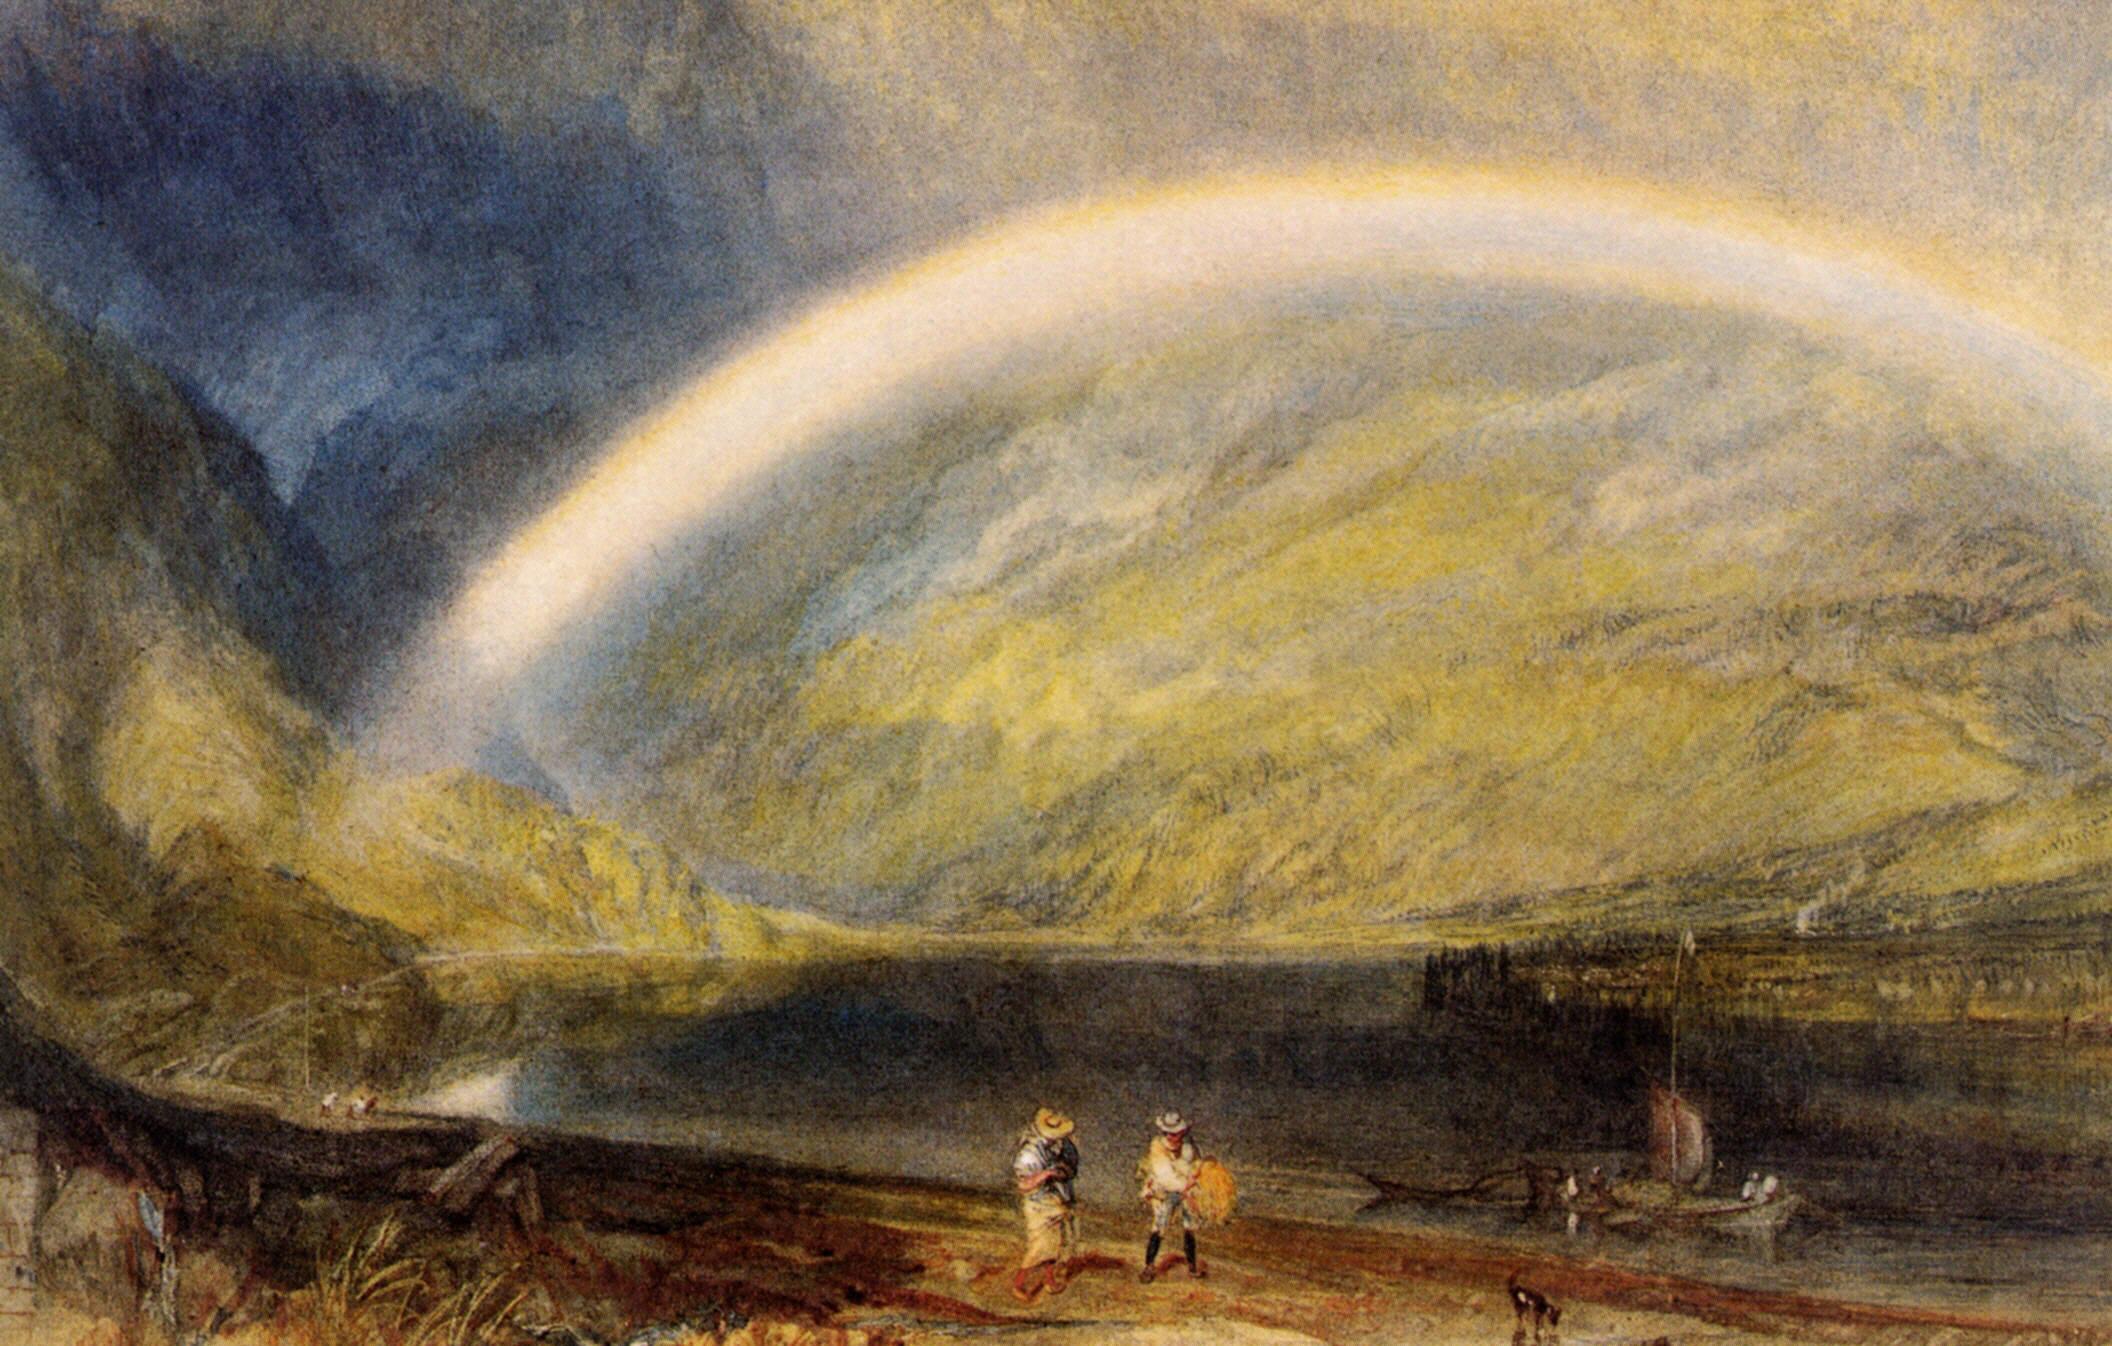 http://uploads1.wikipaintings.org/images/william-turner/rainbow.jpg